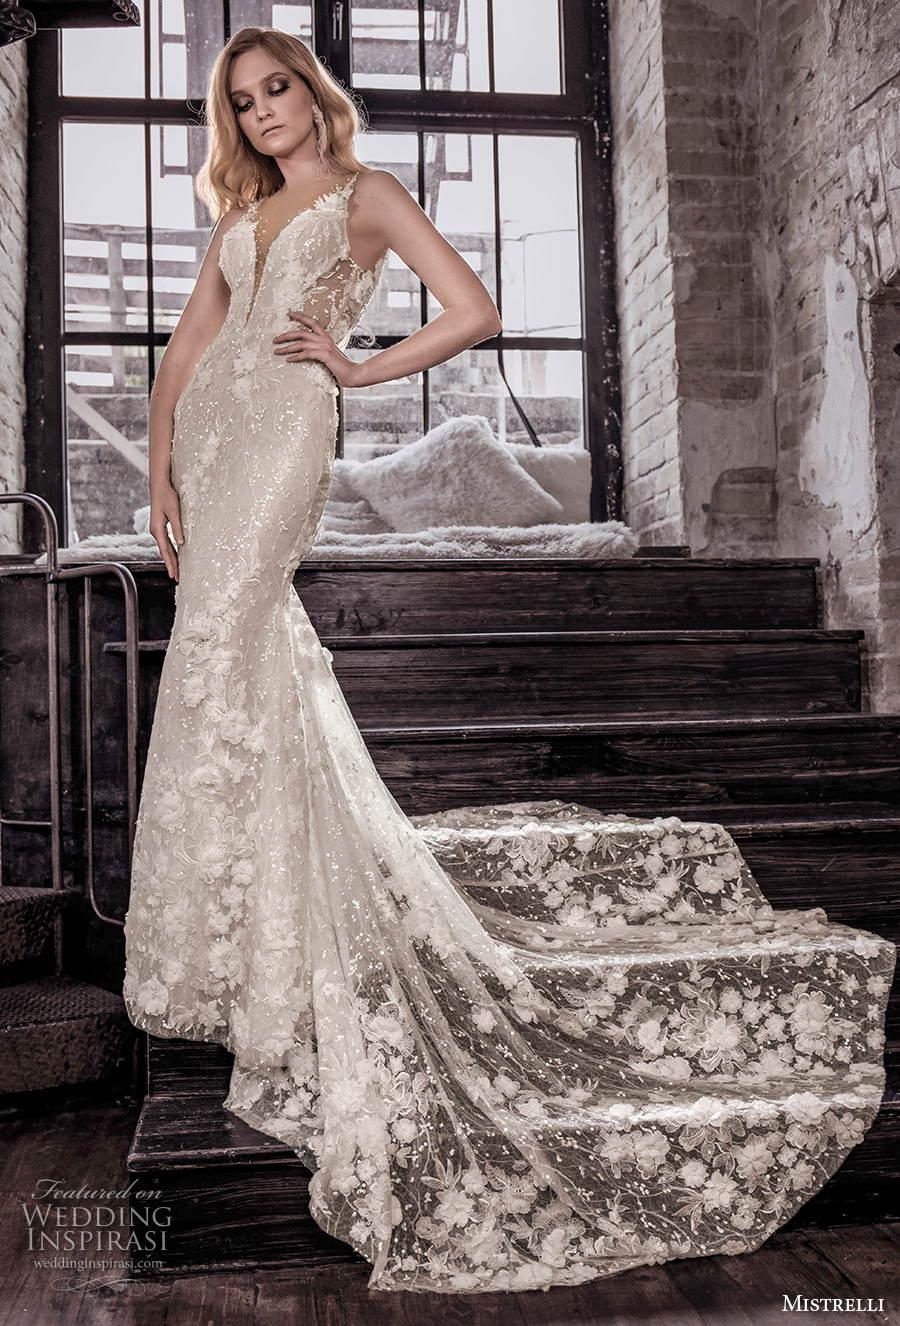 mistrelli 2021 royal drama bridal sleeveless thin strap deep plunging v neck full embellishment glamorous elegant sheath wedding dress backless low back medium train (4) mv